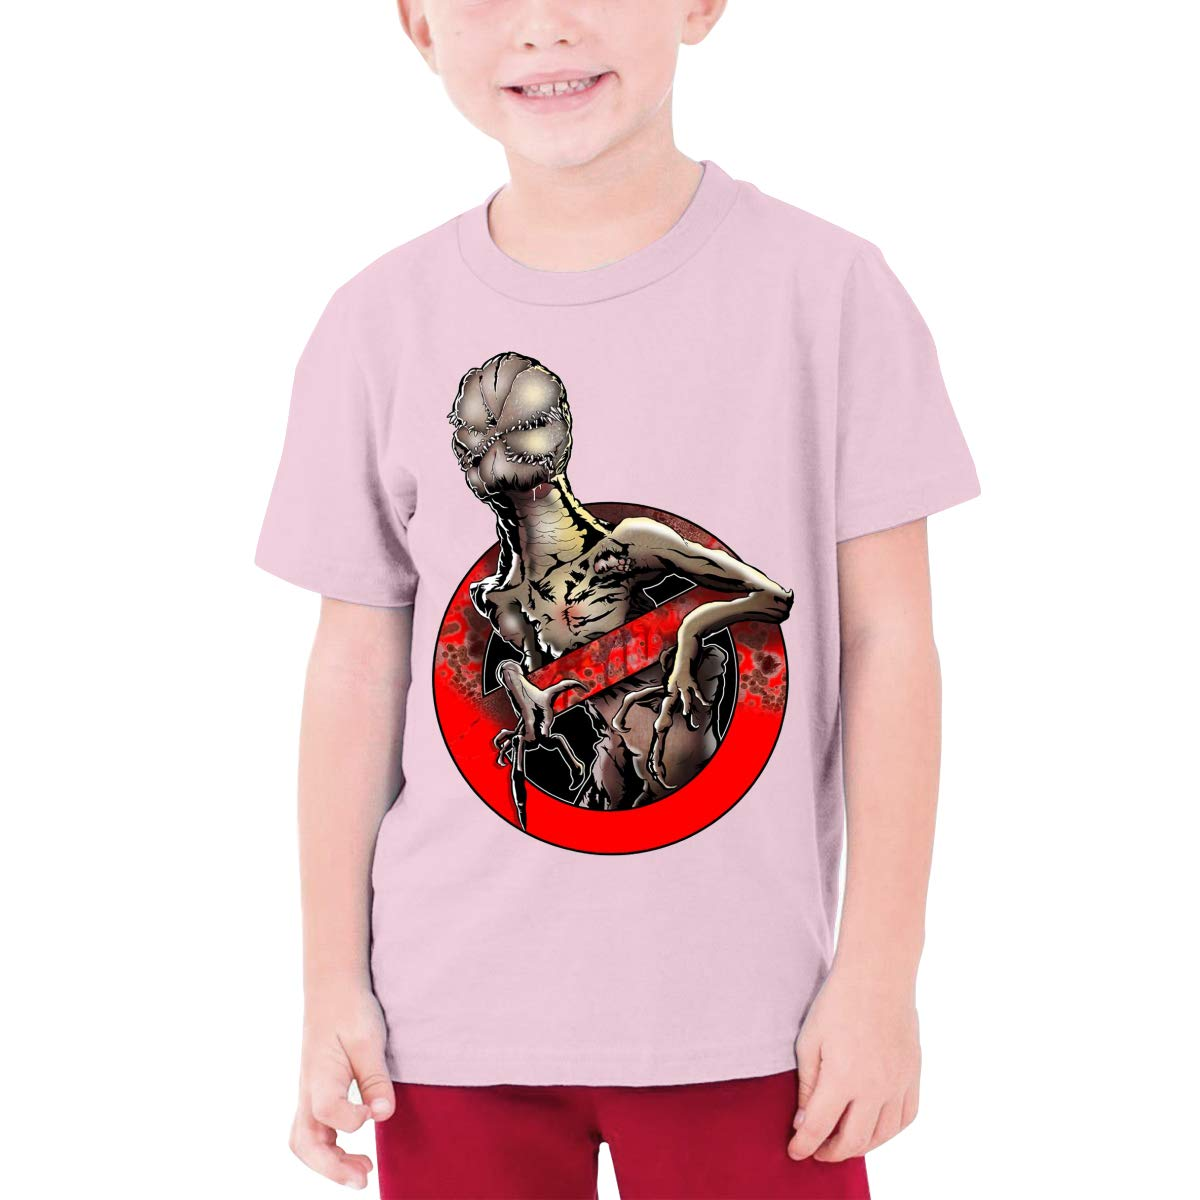 Magicuas Kid T Shirt S-S-Stranger Thing-s Fan Short-Sleeve Tops Children Tee Teenage Halloween Tshirt for Boy Girl Black